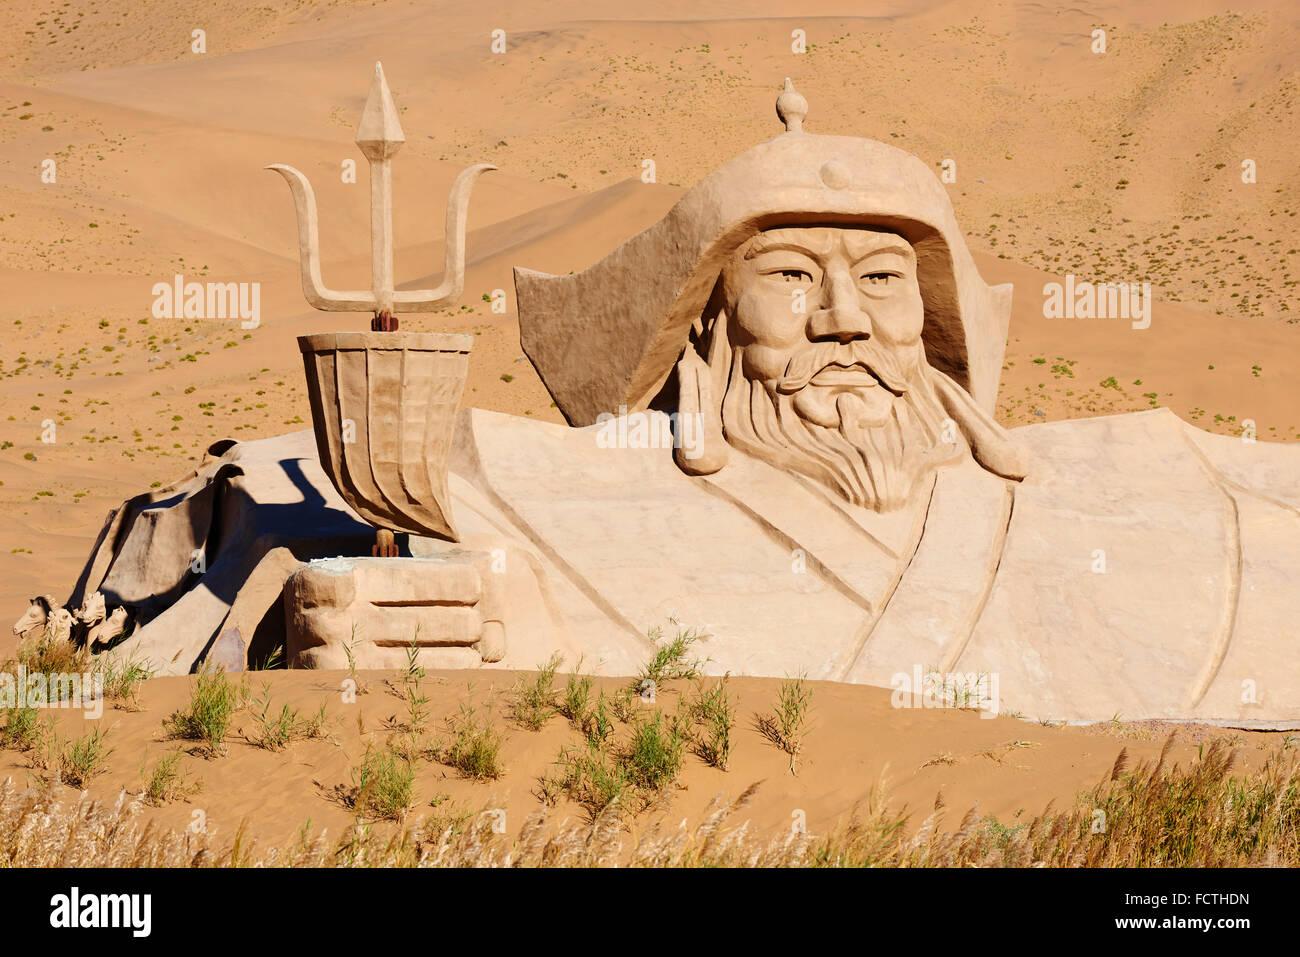 China, Innere Mongolei, Badain Jaran Wüste, Gobi Wüste, Dschingis Khan Statue, mongolischen Kaiser Stockbild